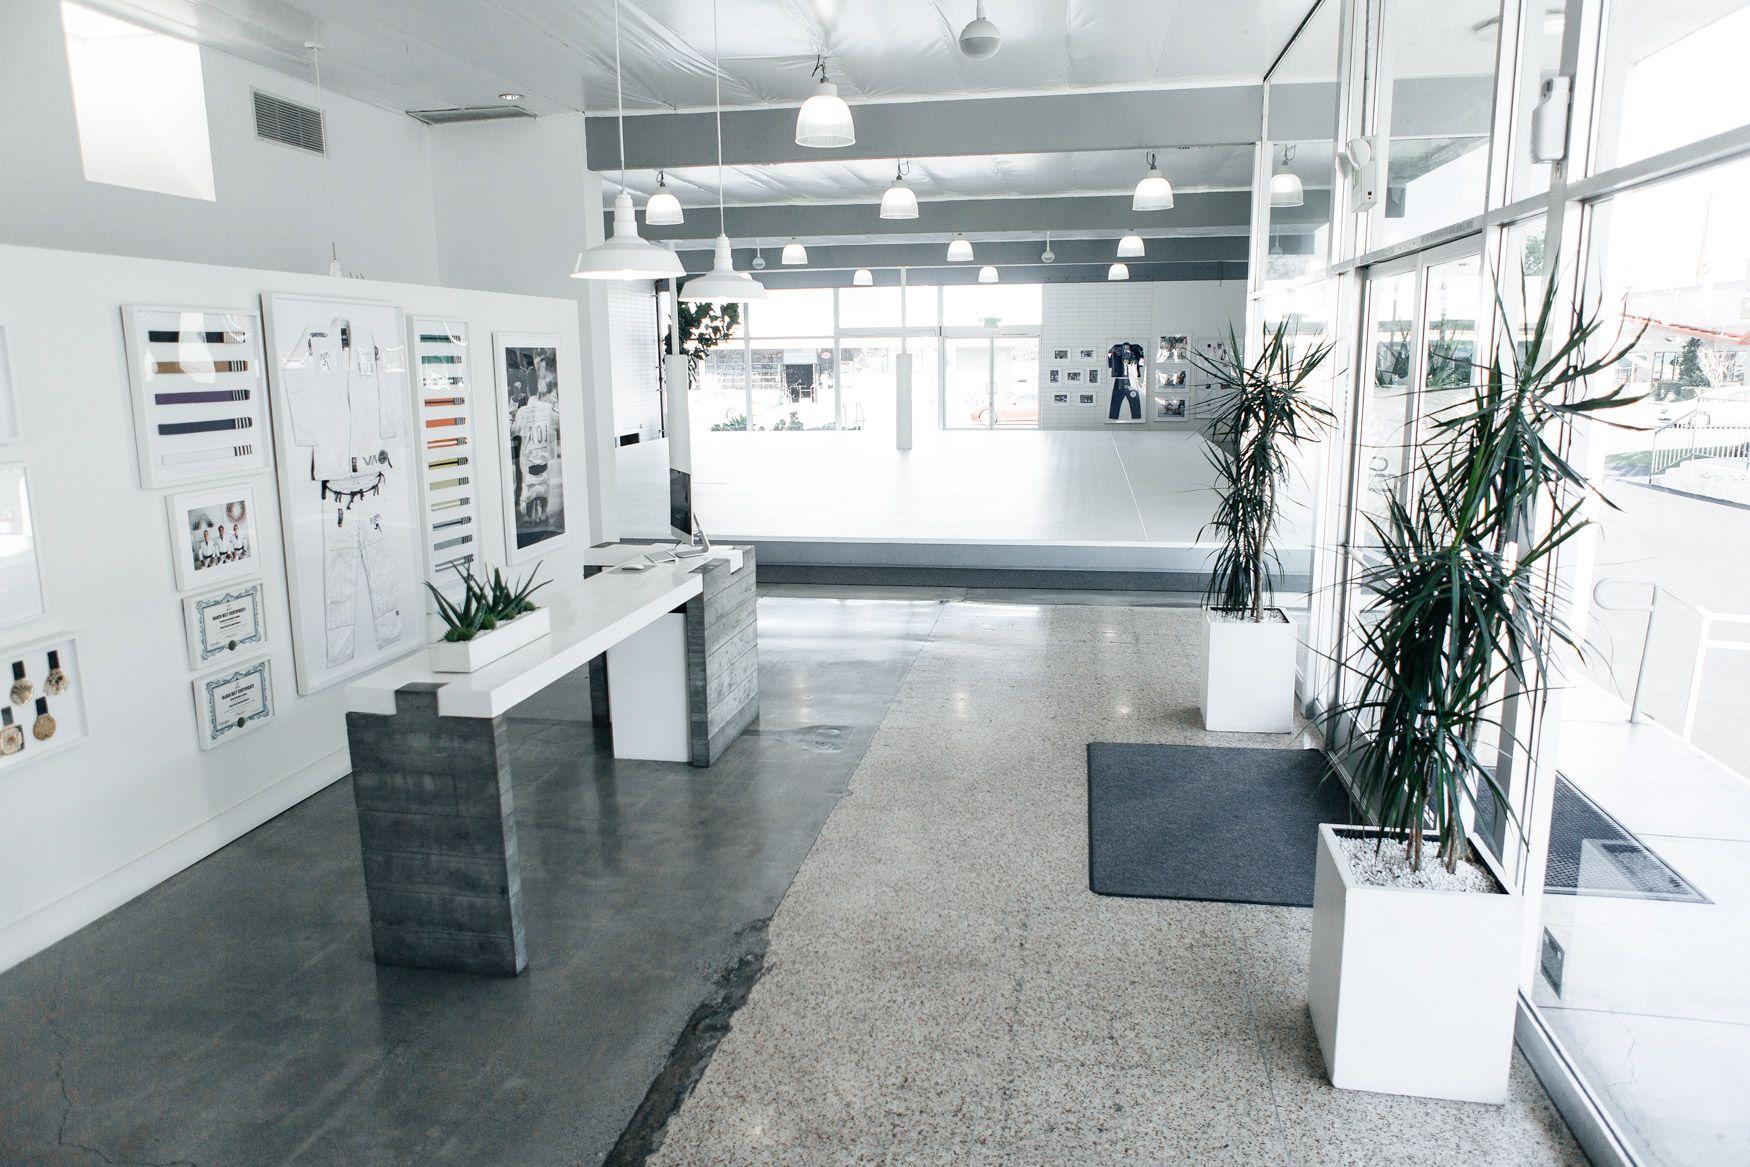 Art of jiu jitsu facility dojo design gym interior gym